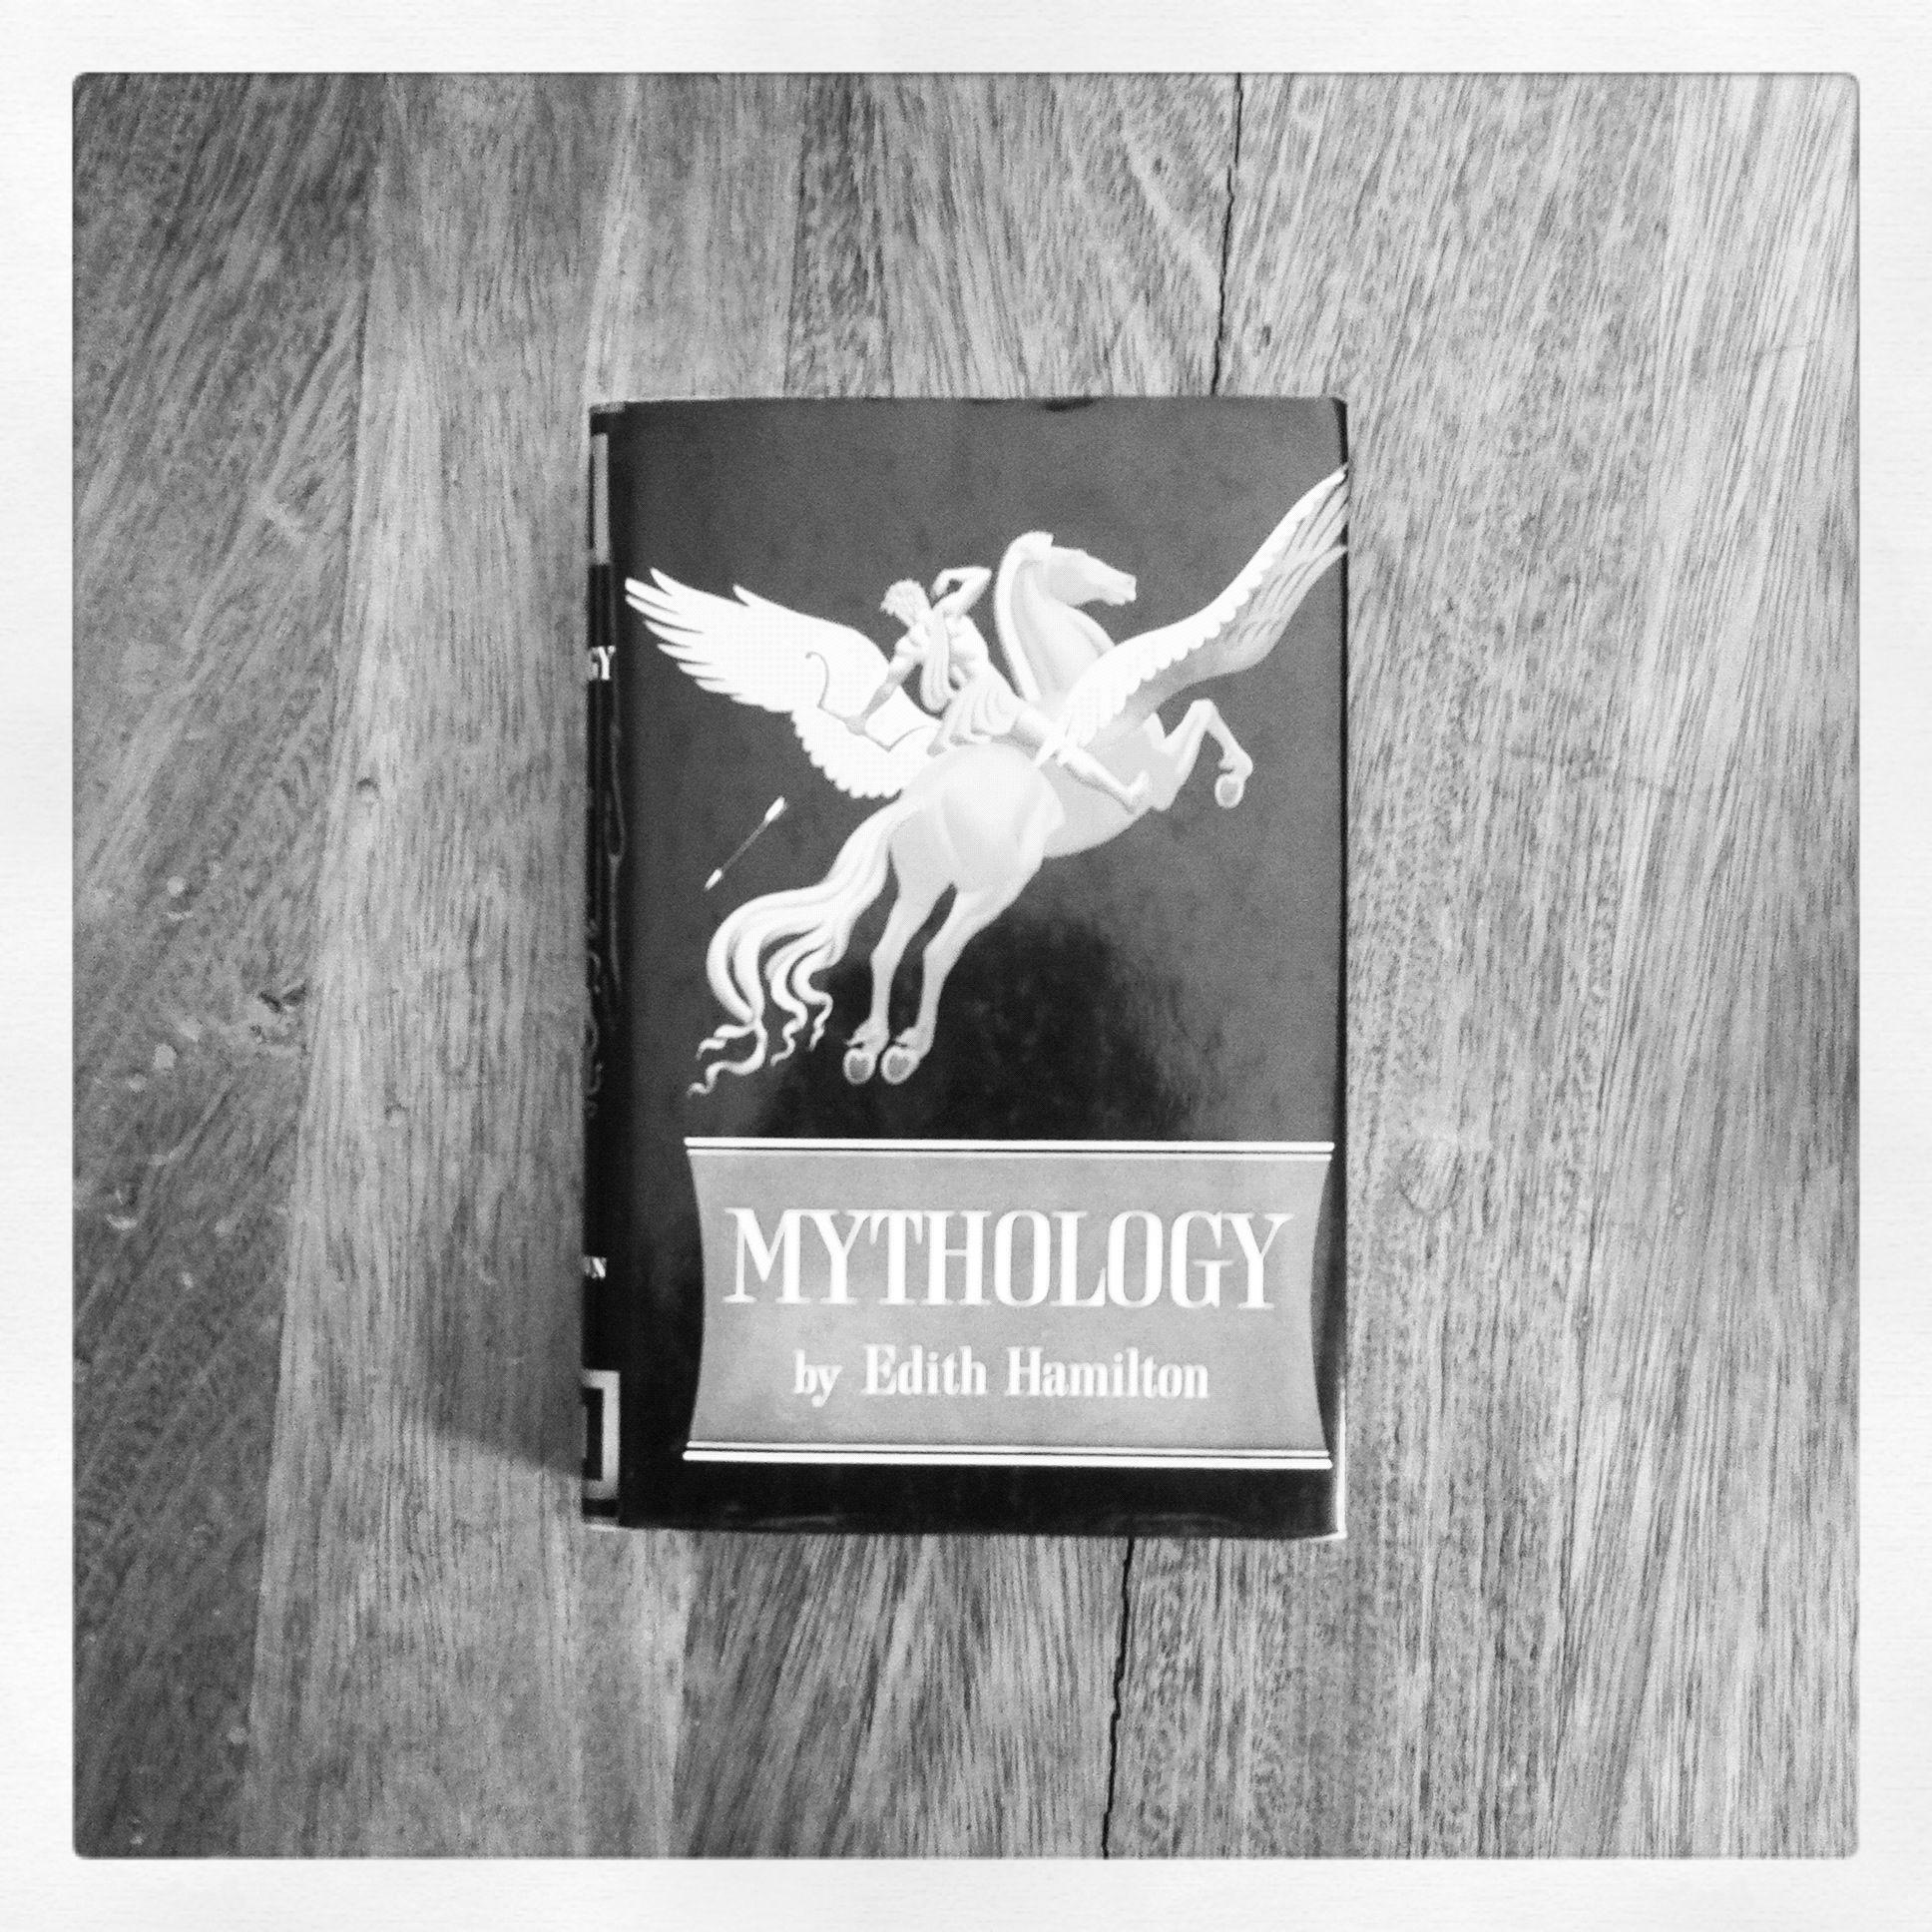 Essays on mythology by edith hamilton